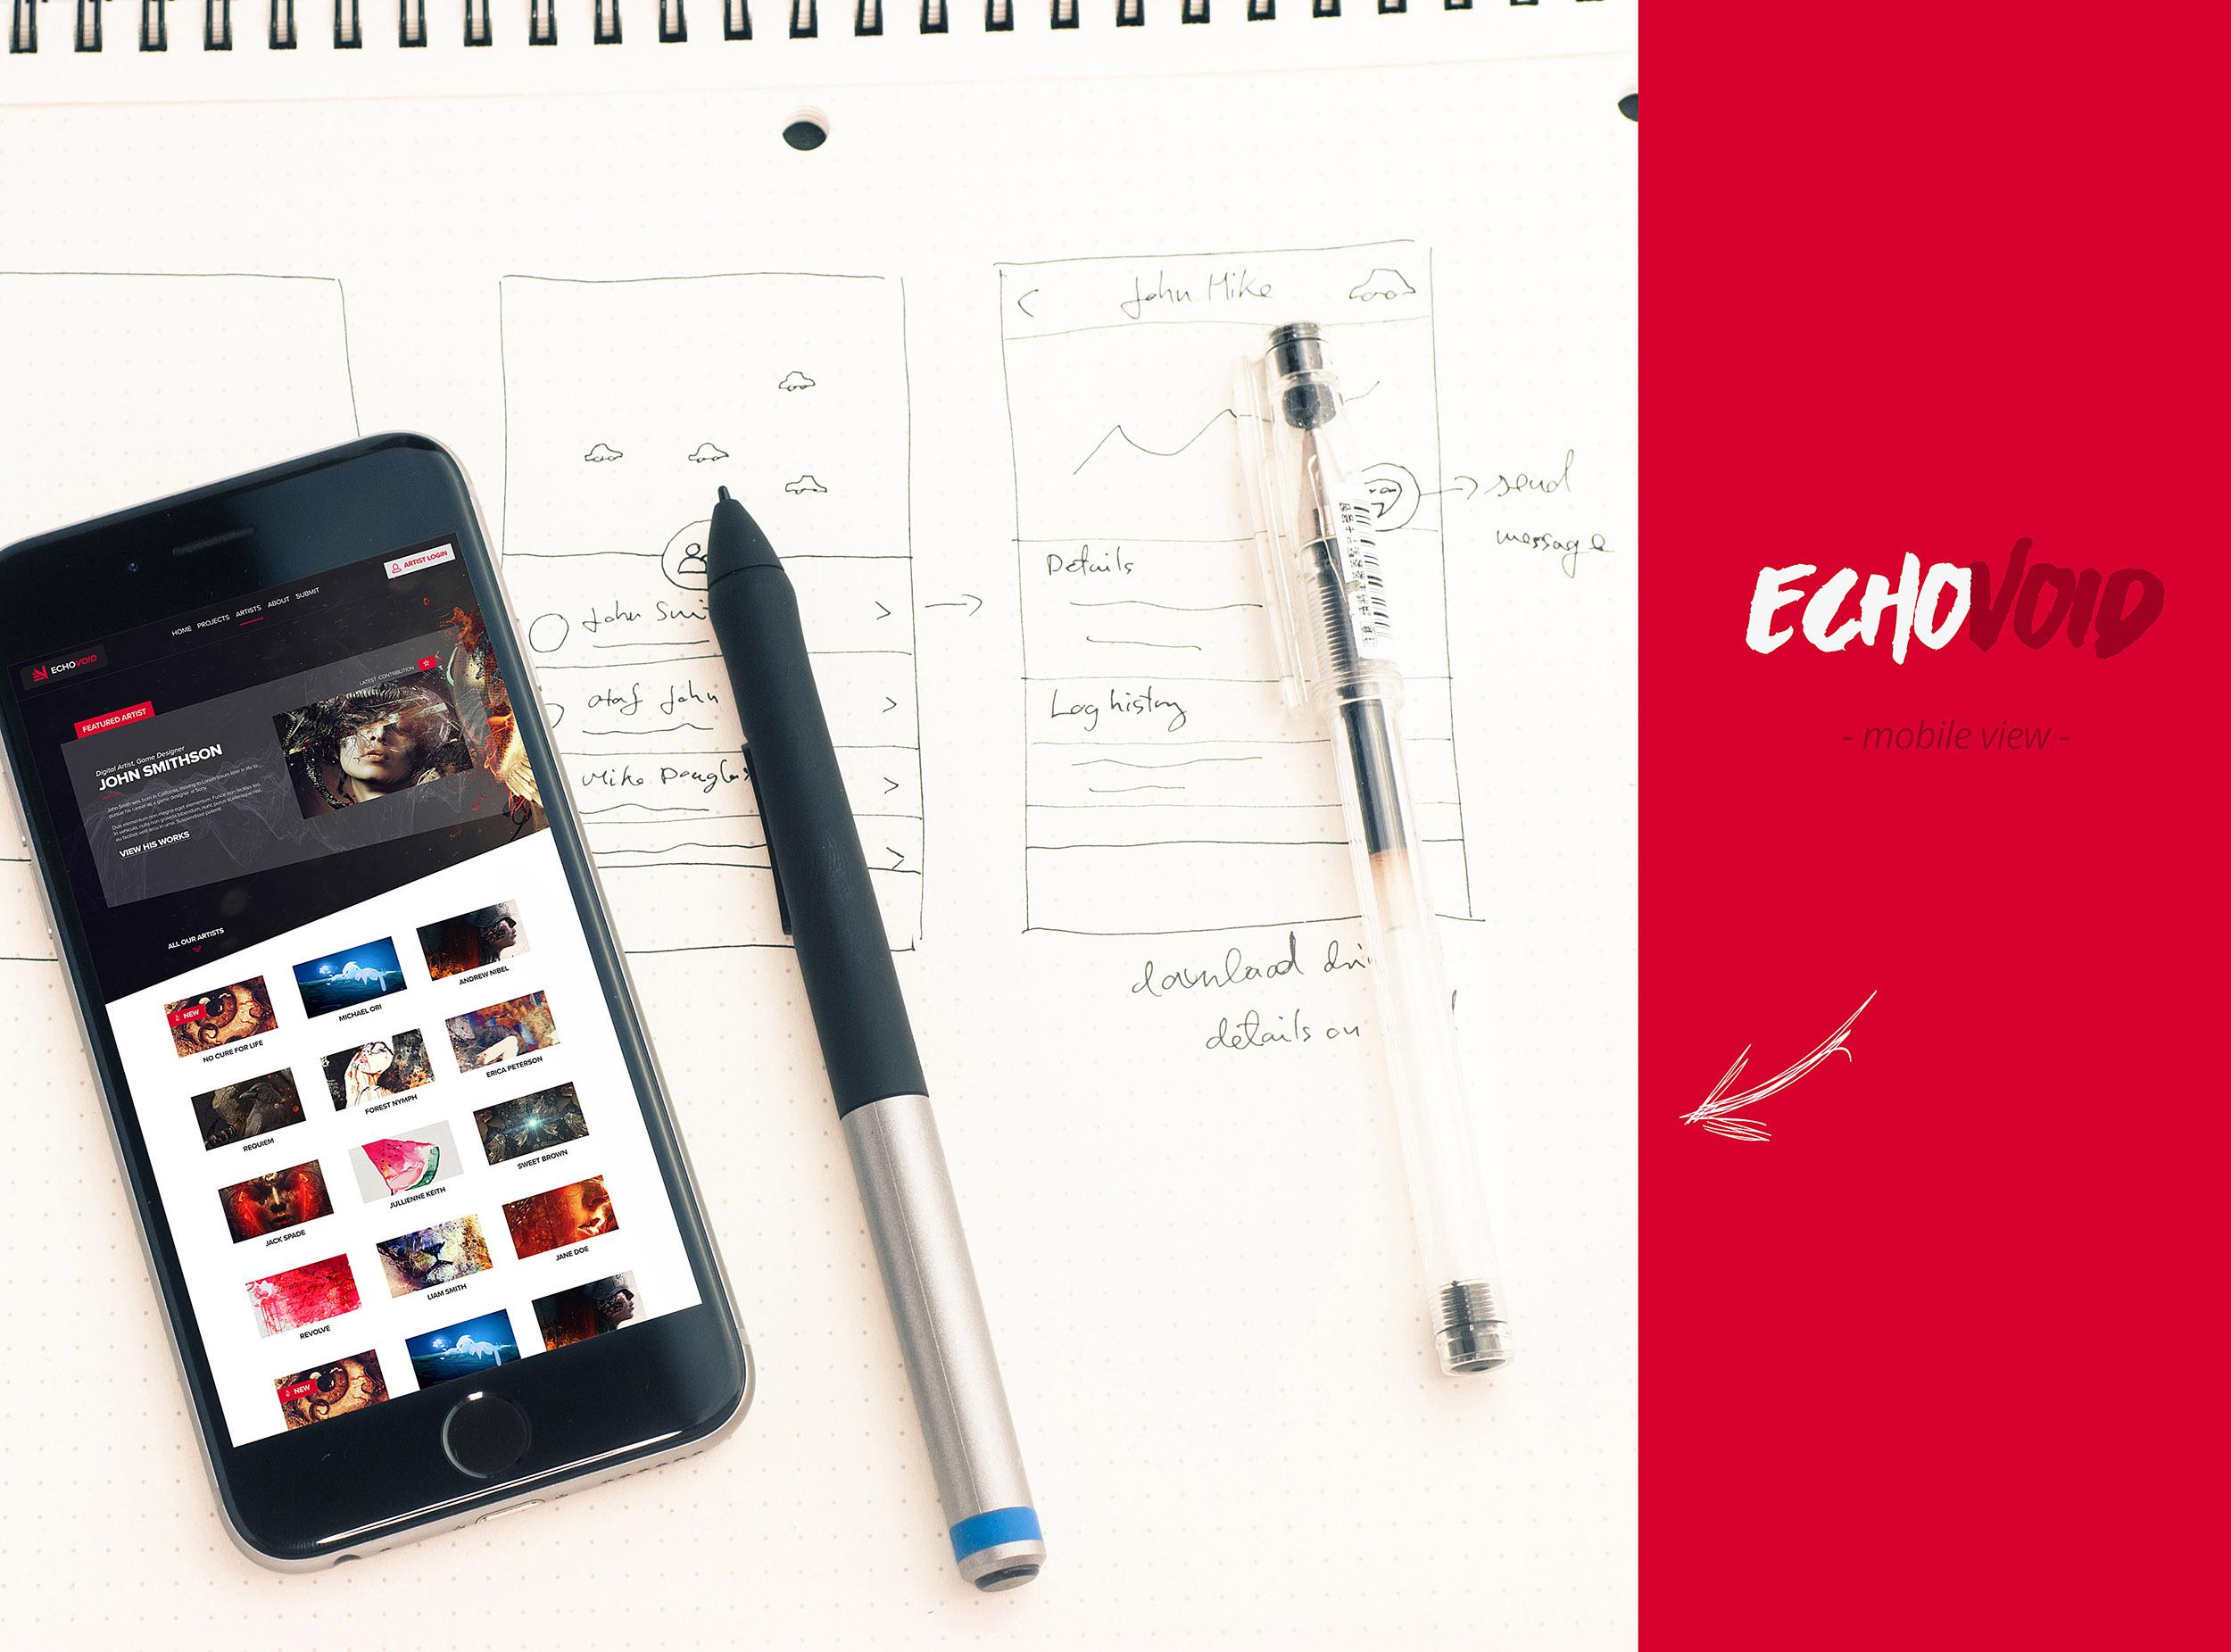 EchoVoid Web Design - Wireframes Mobile